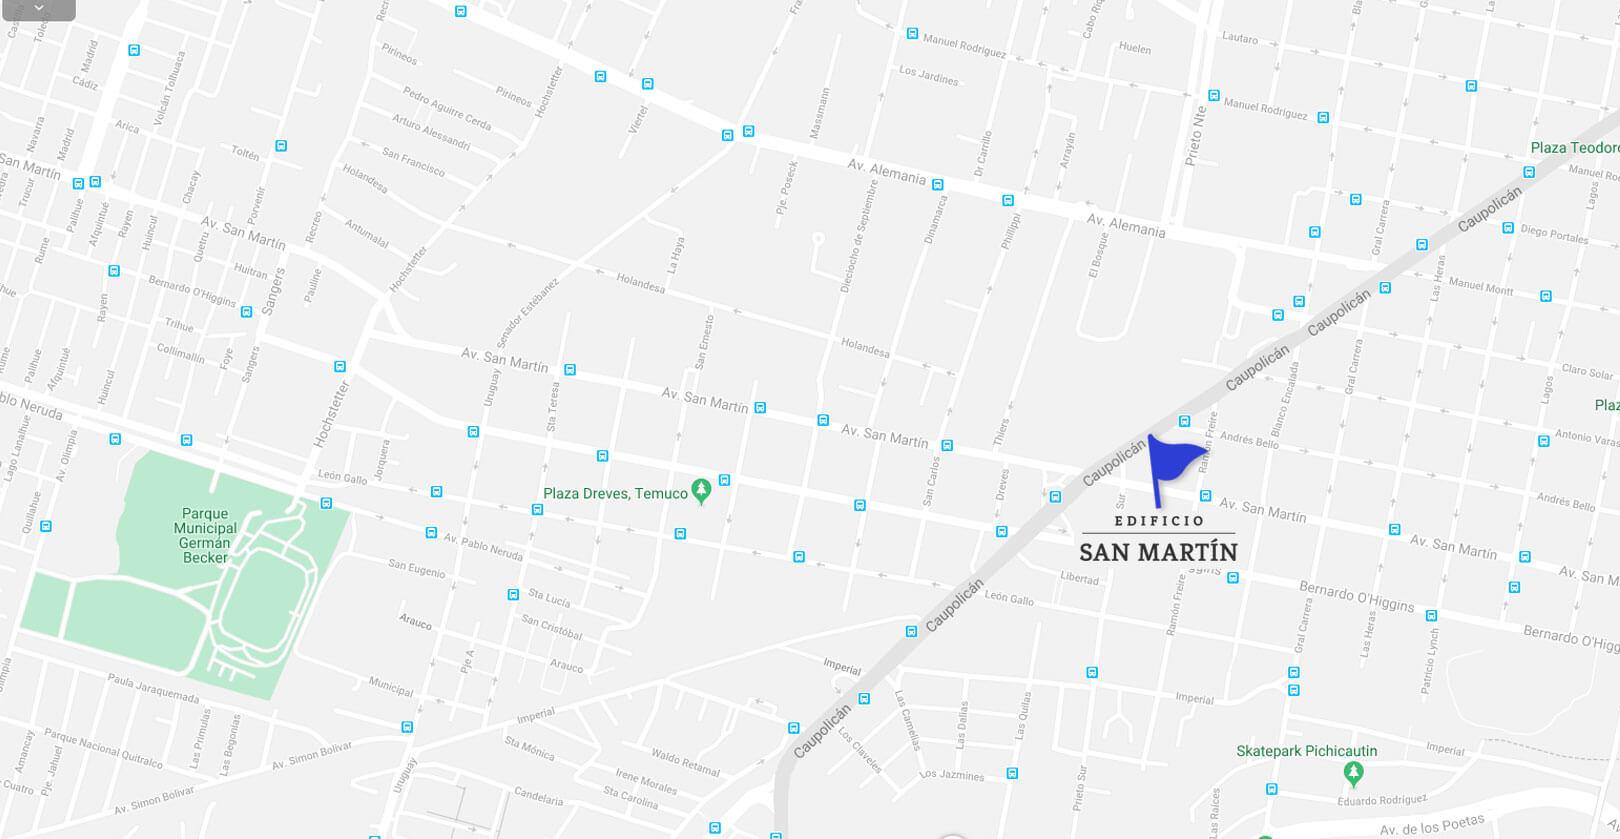 dubois-edificio-san-martin-Mapa